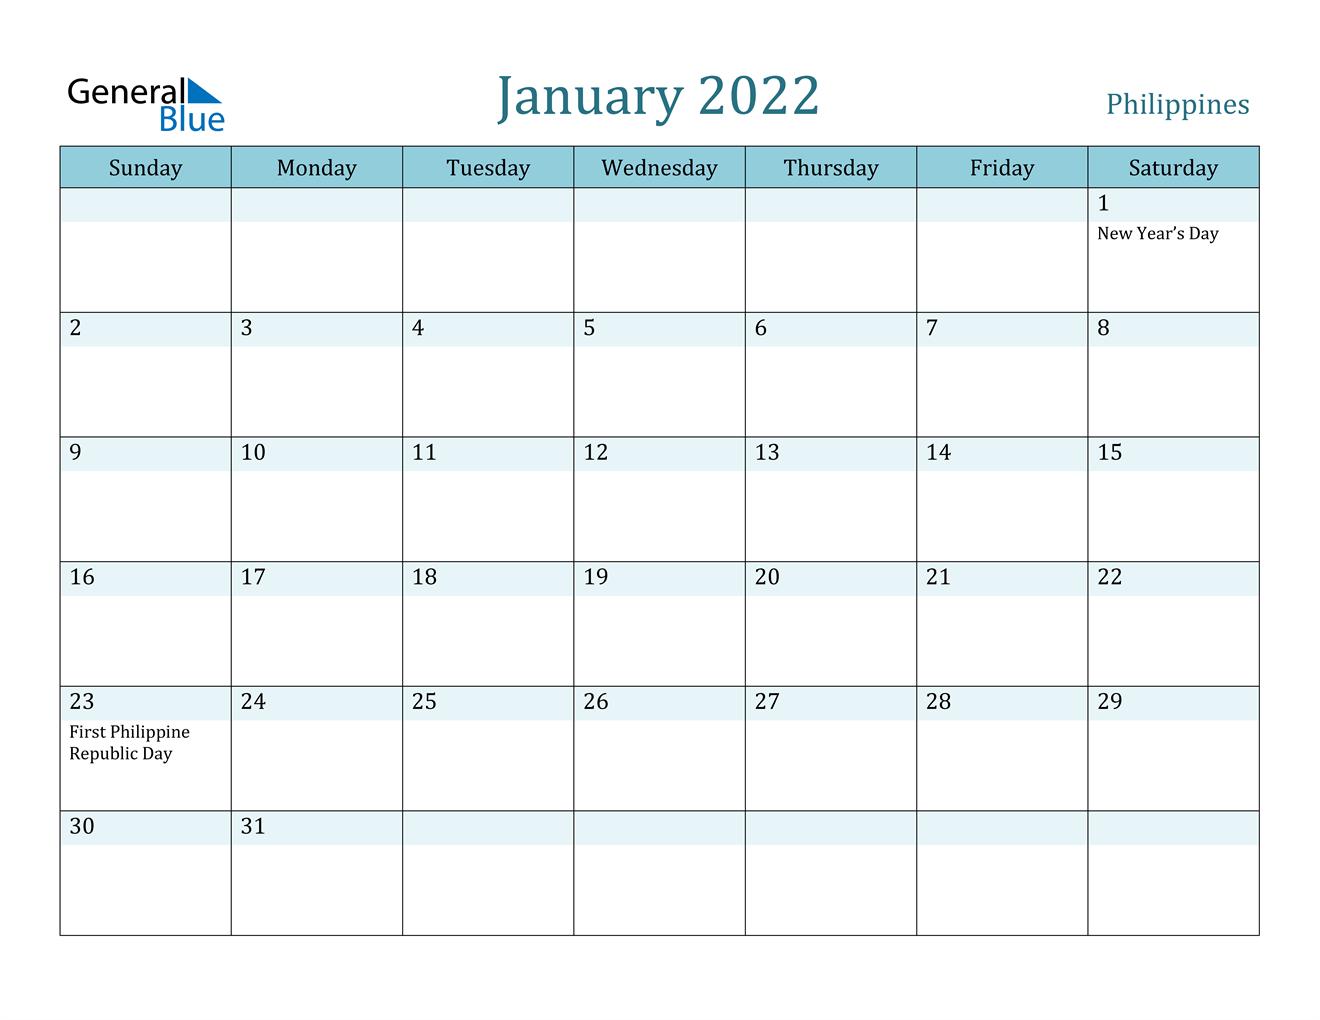 January 2022 Calendar - Philippines